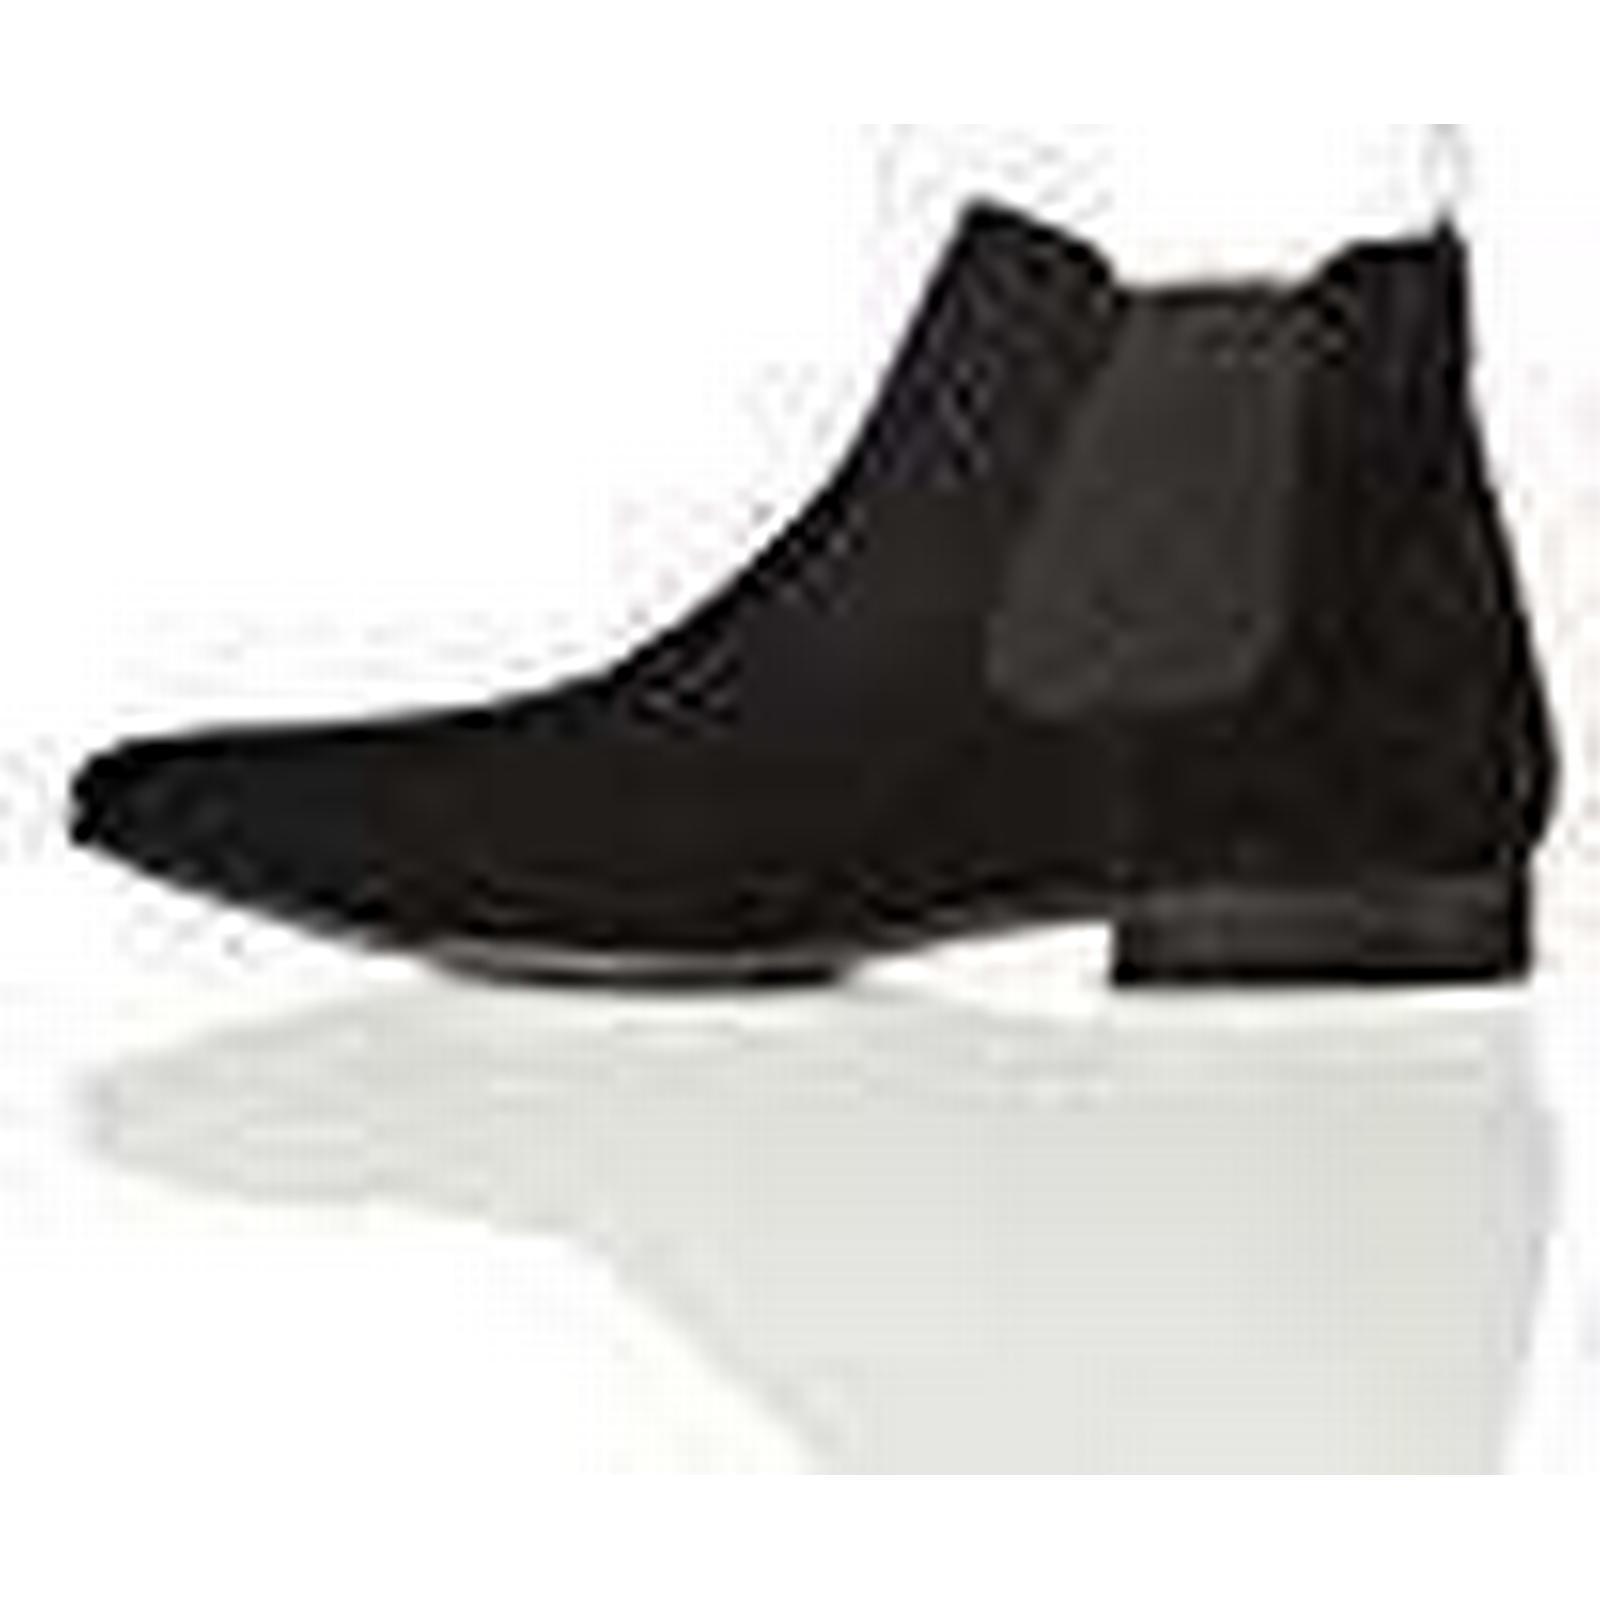 FIND Albany Formal, 12 Men's Chelsea Boots, Black, 12 Formal, UK (46 EU) 68fa1a